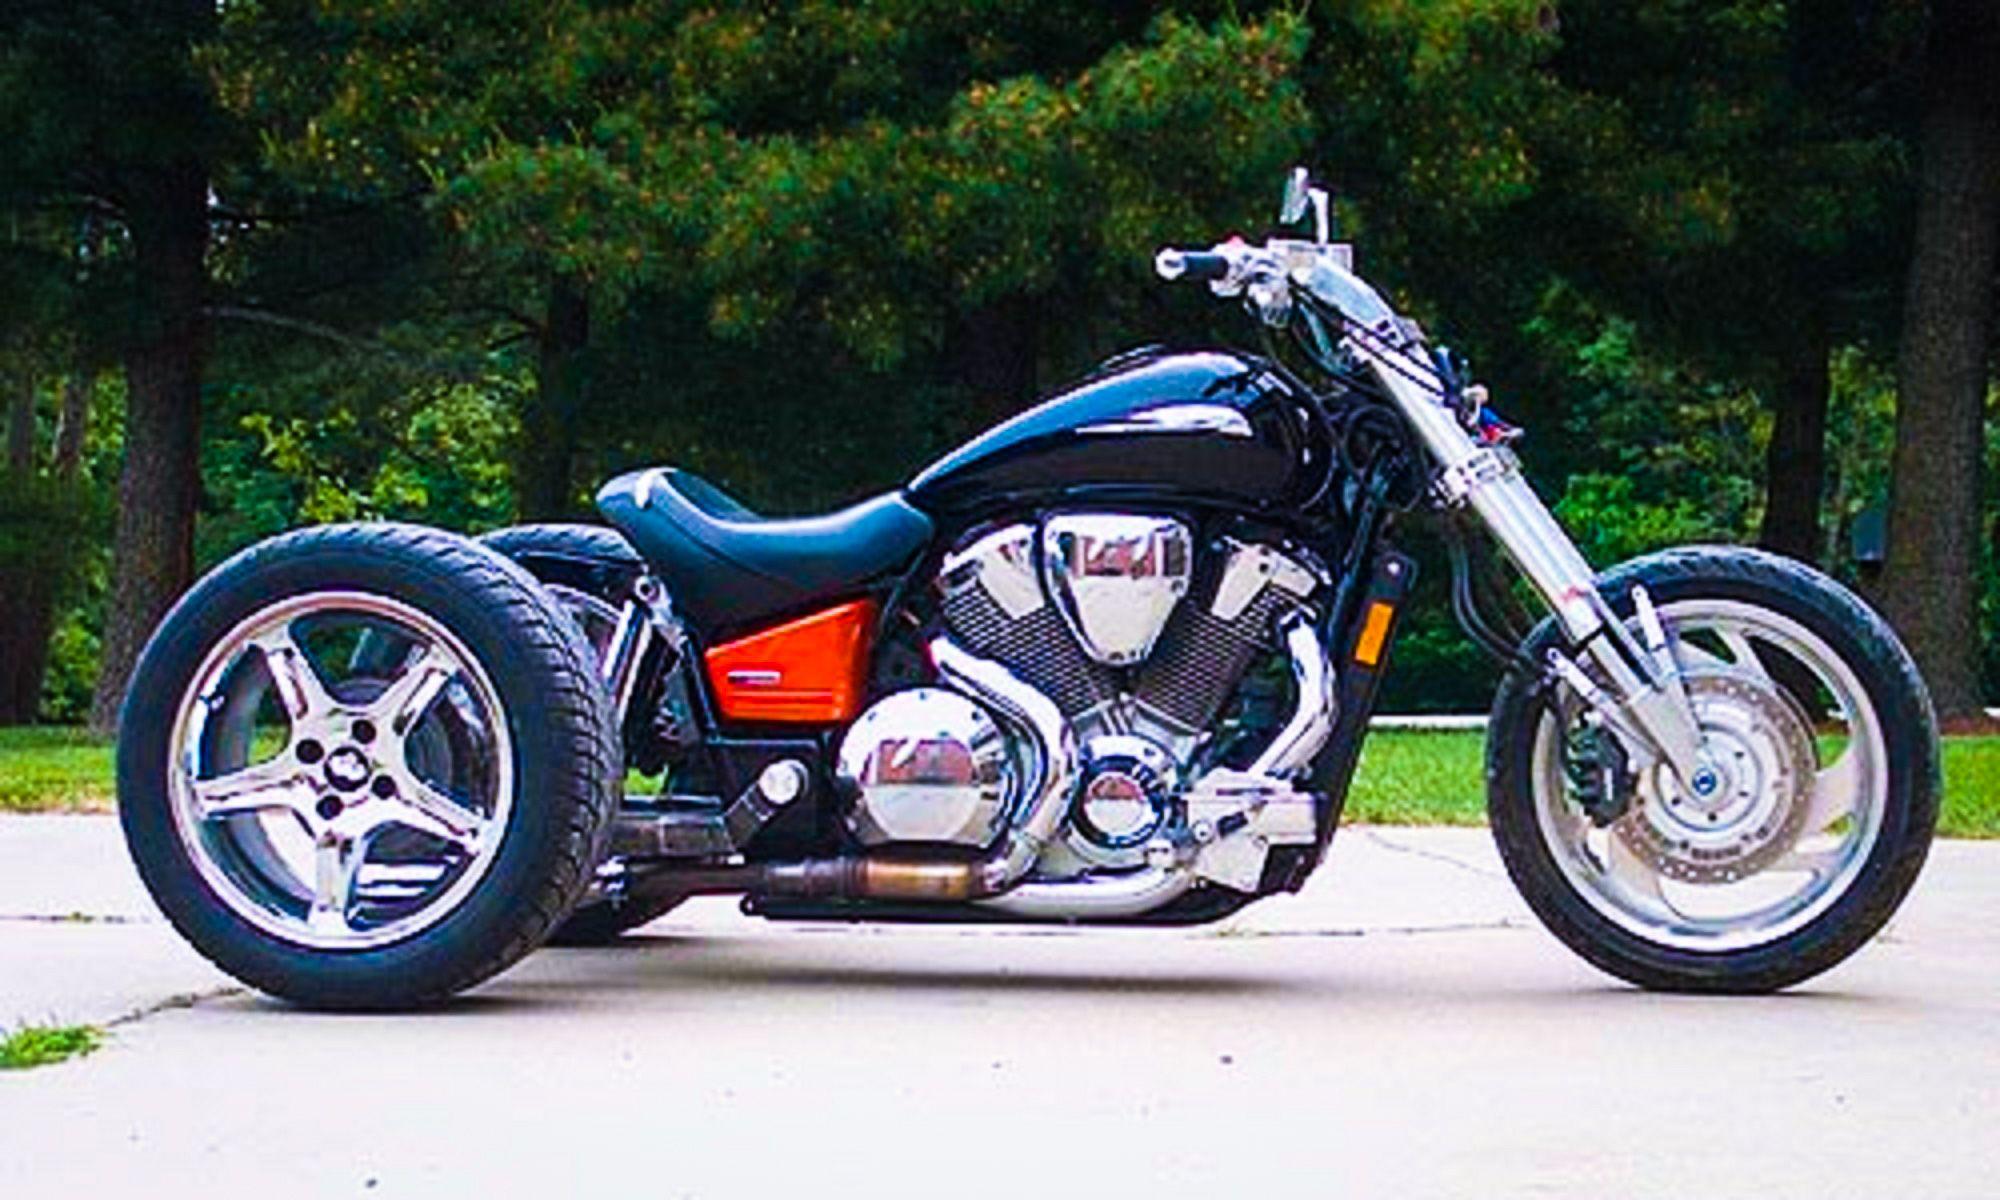 Mid MO MC Mid Missouri Motorcycles Honda VTX1800 Trike